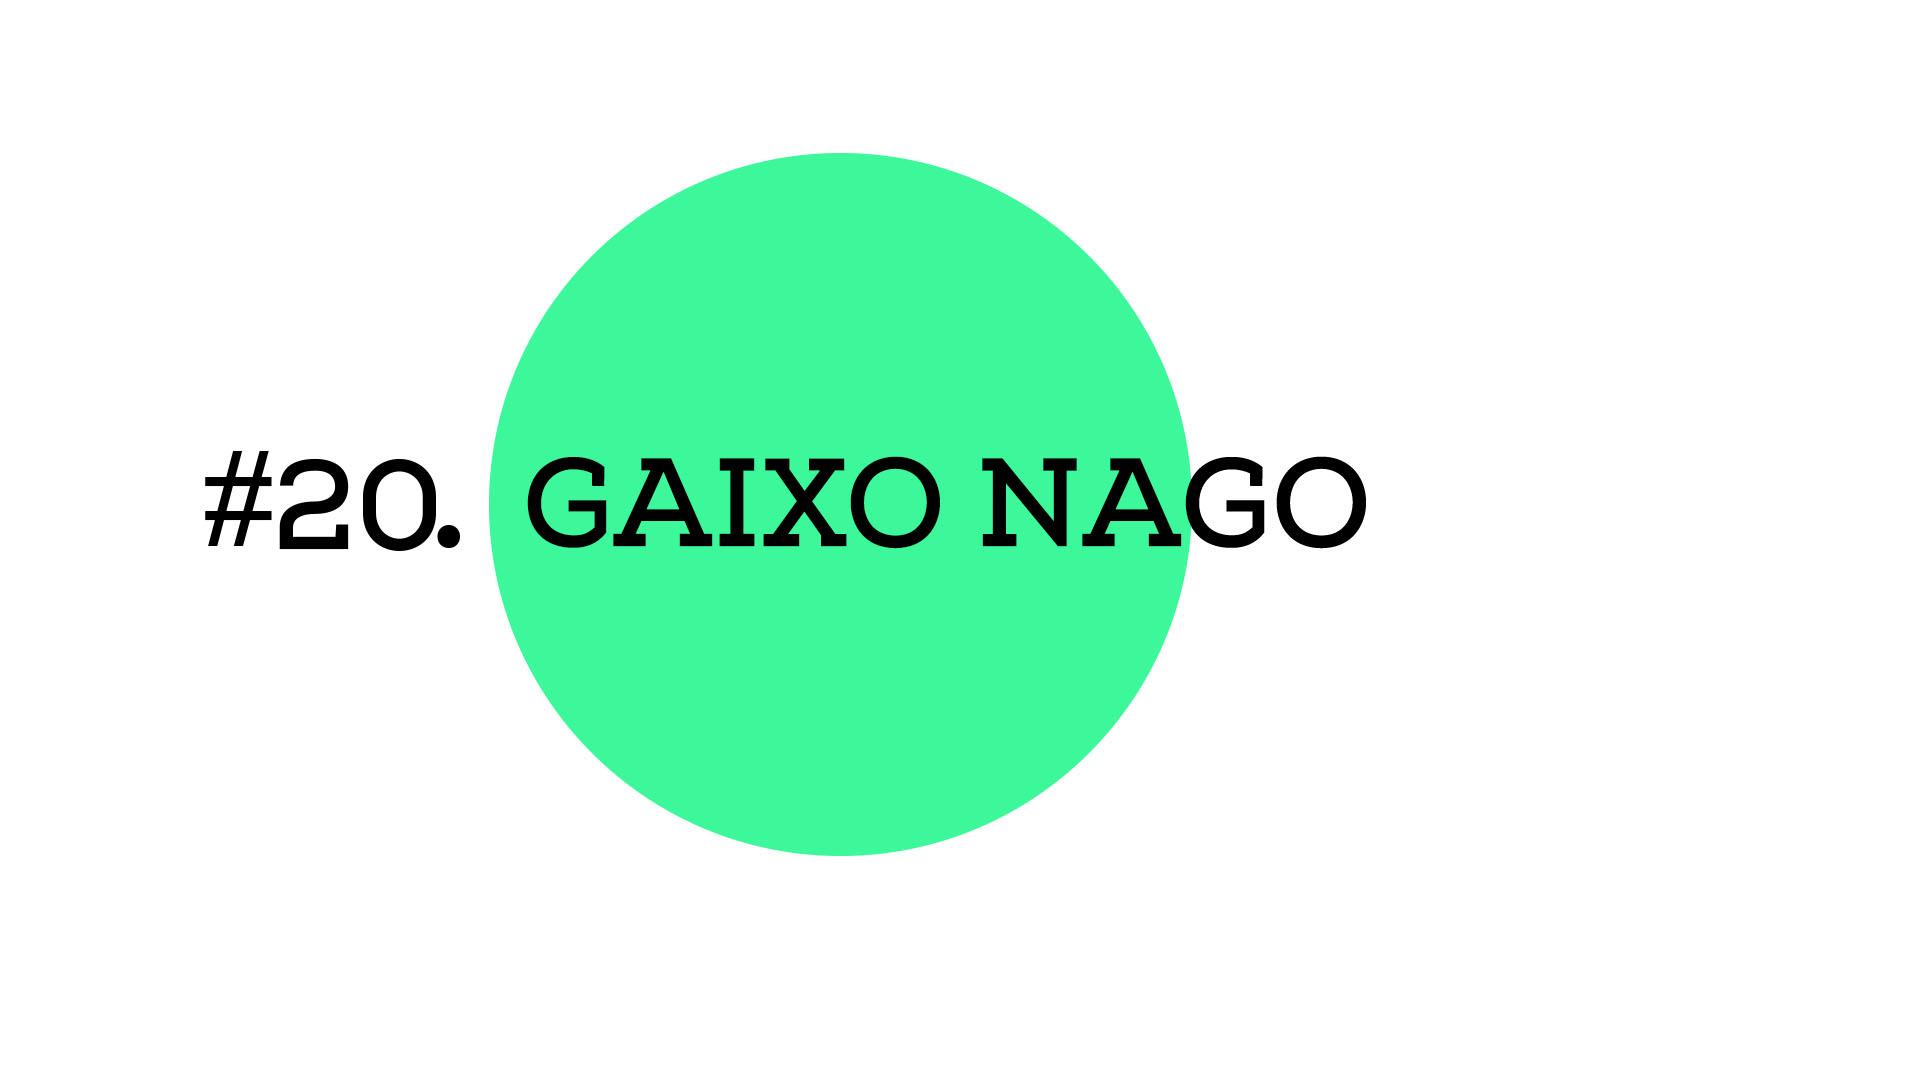 Gaixo nago (A1E20)